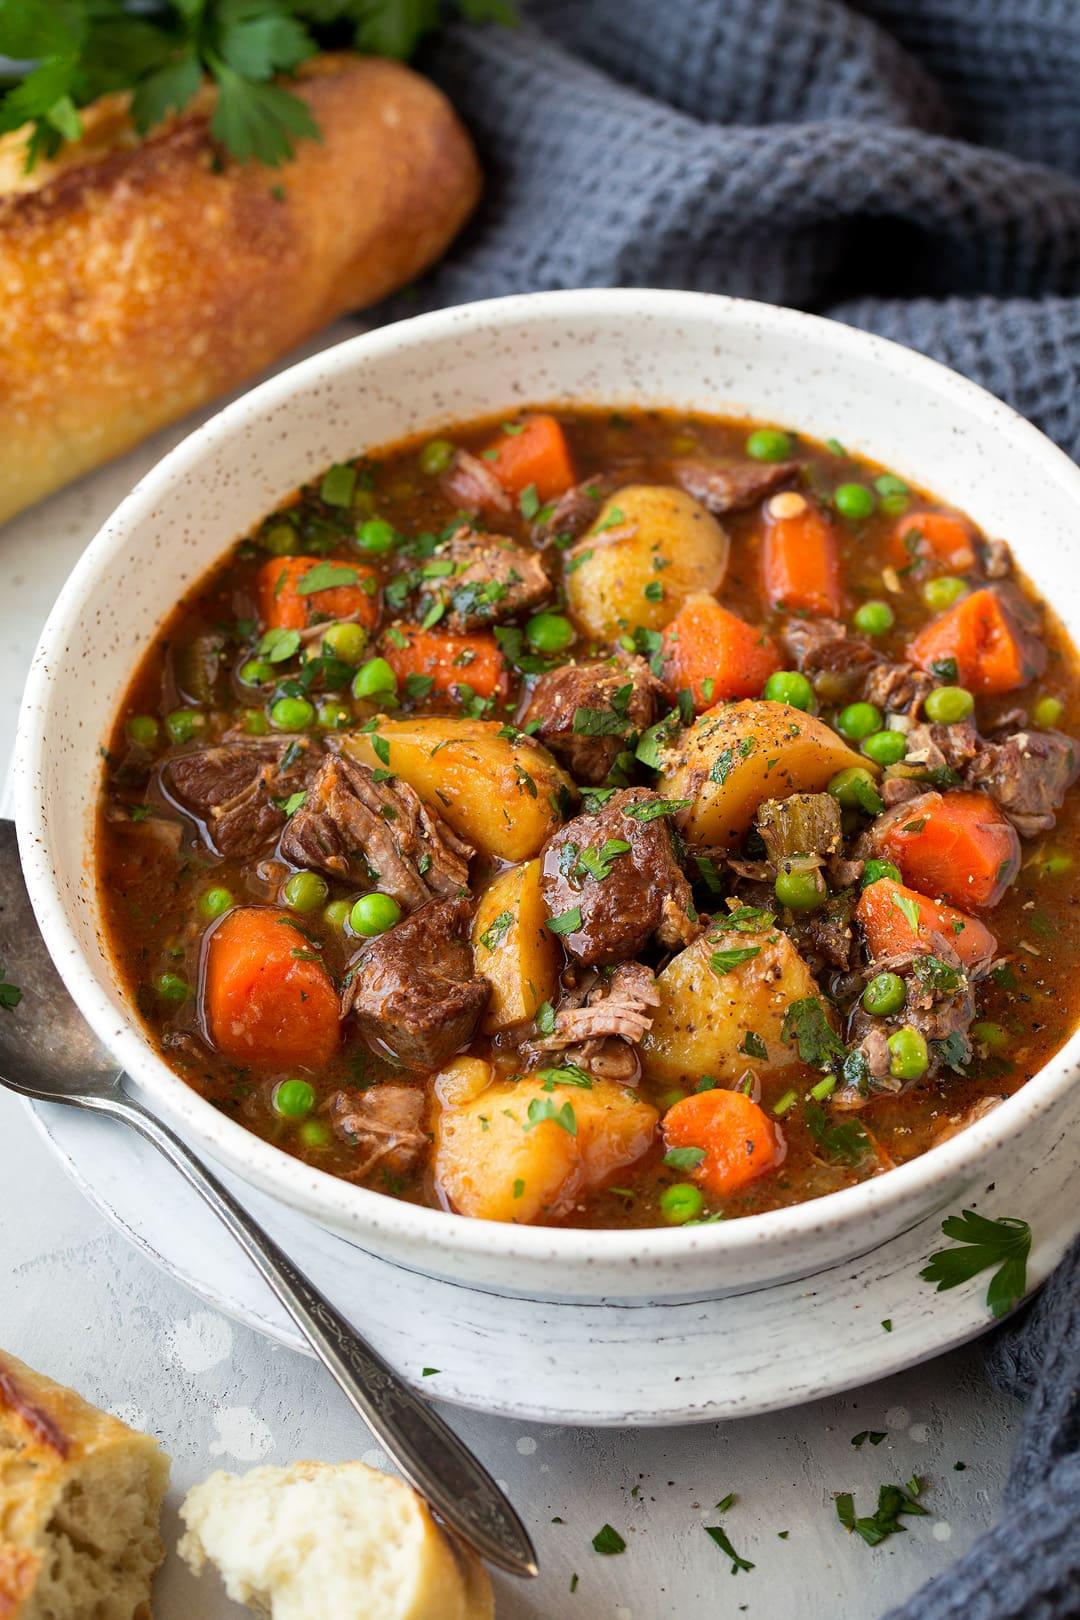 Betty crocker old fashioned beef stew 13